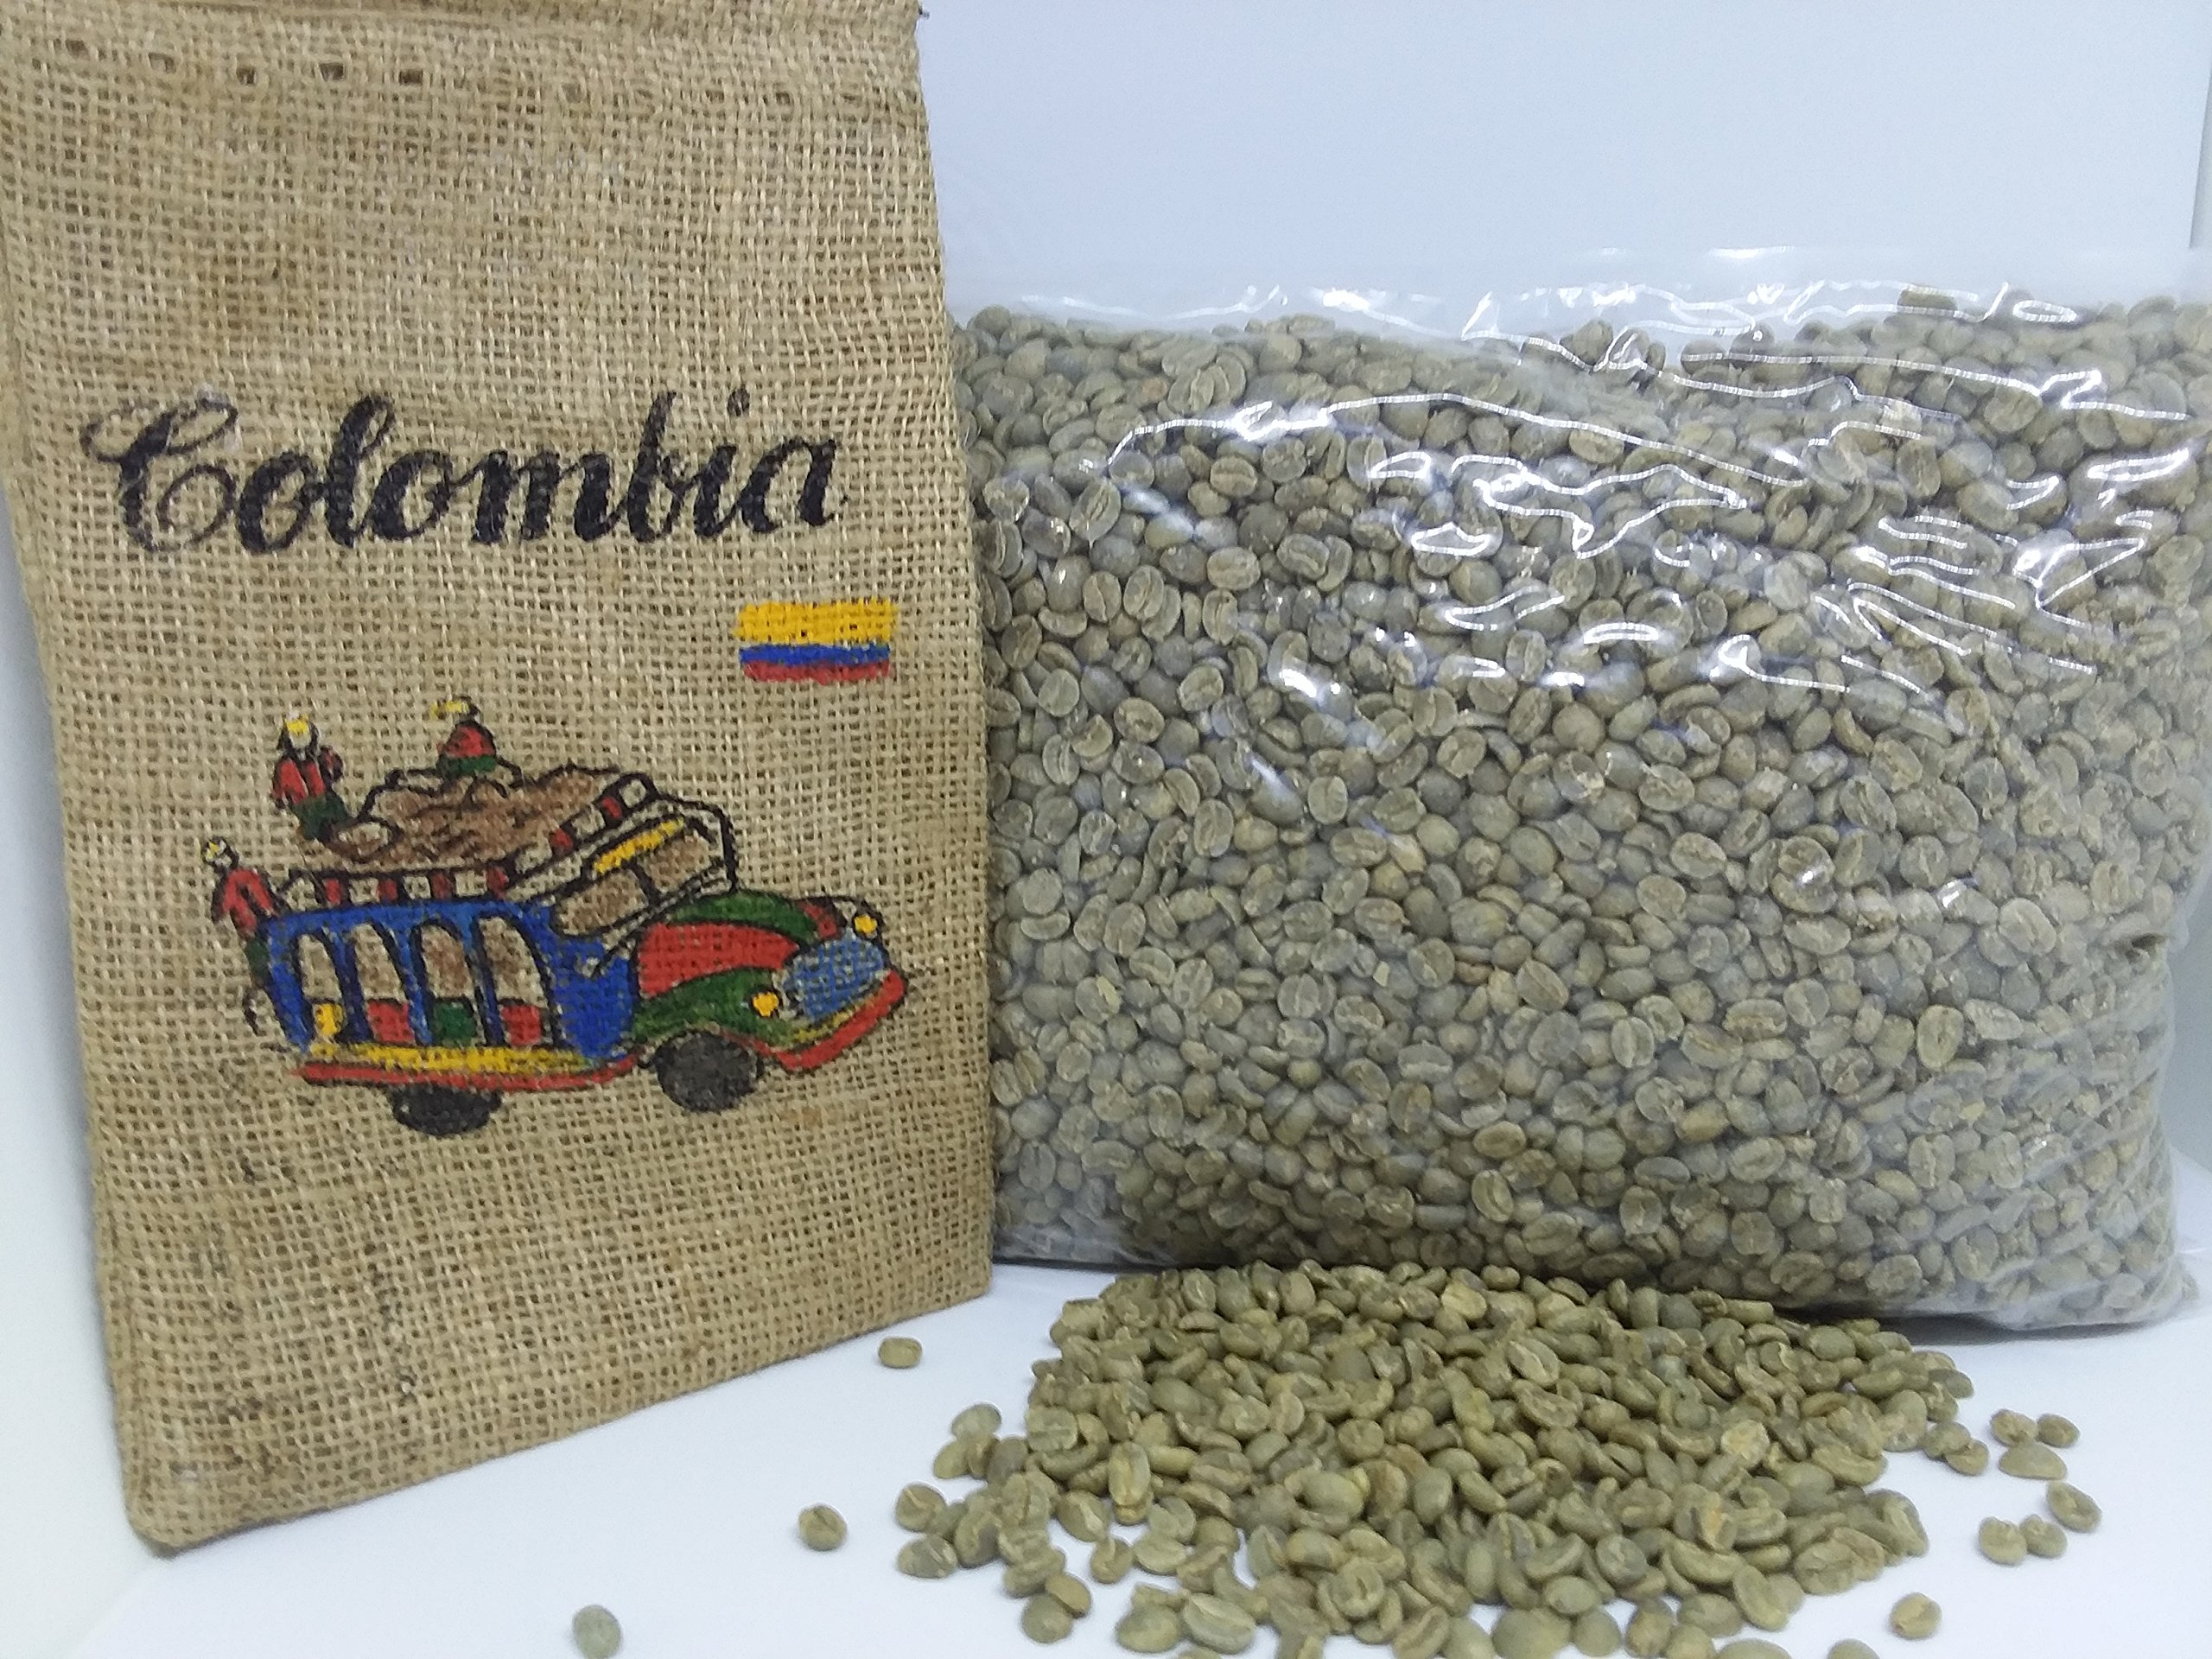 Unroasted Coffee Beans - Colombian coffee 6 lb - Green coffee beans -Single Origin Coffee